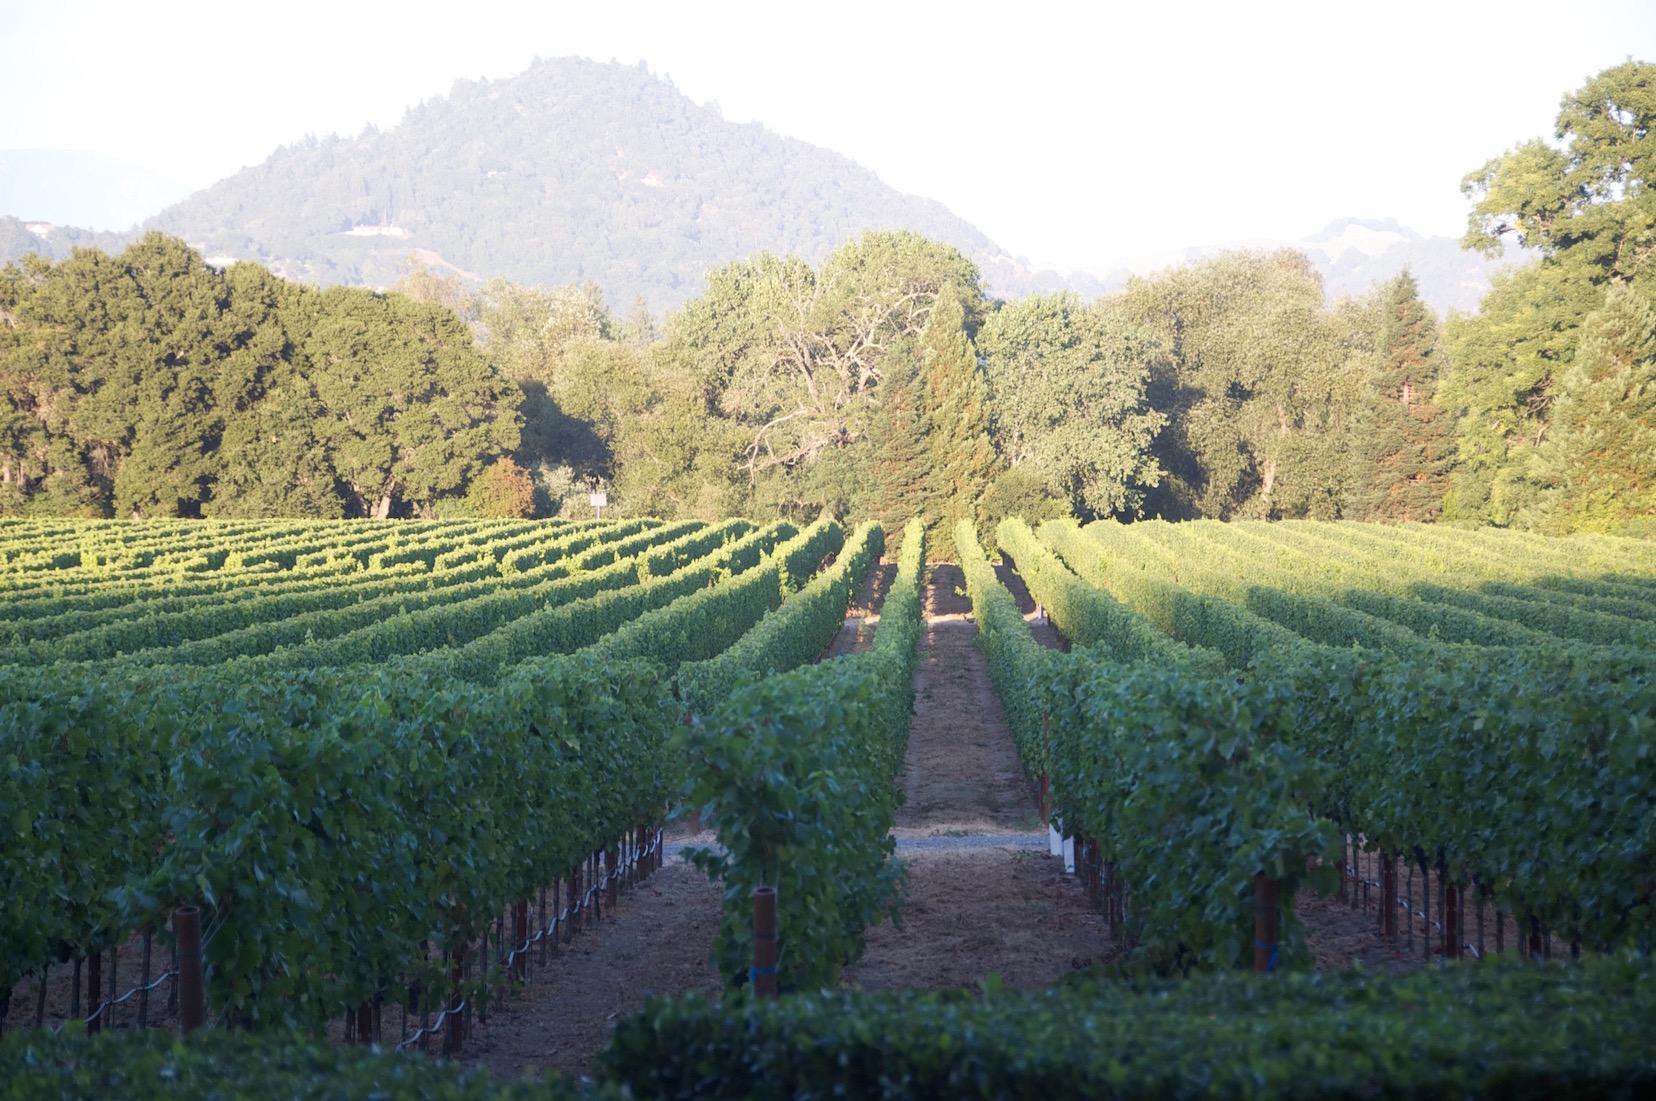 Sauvignon Blanc vineyard in the Dry Creek Valley